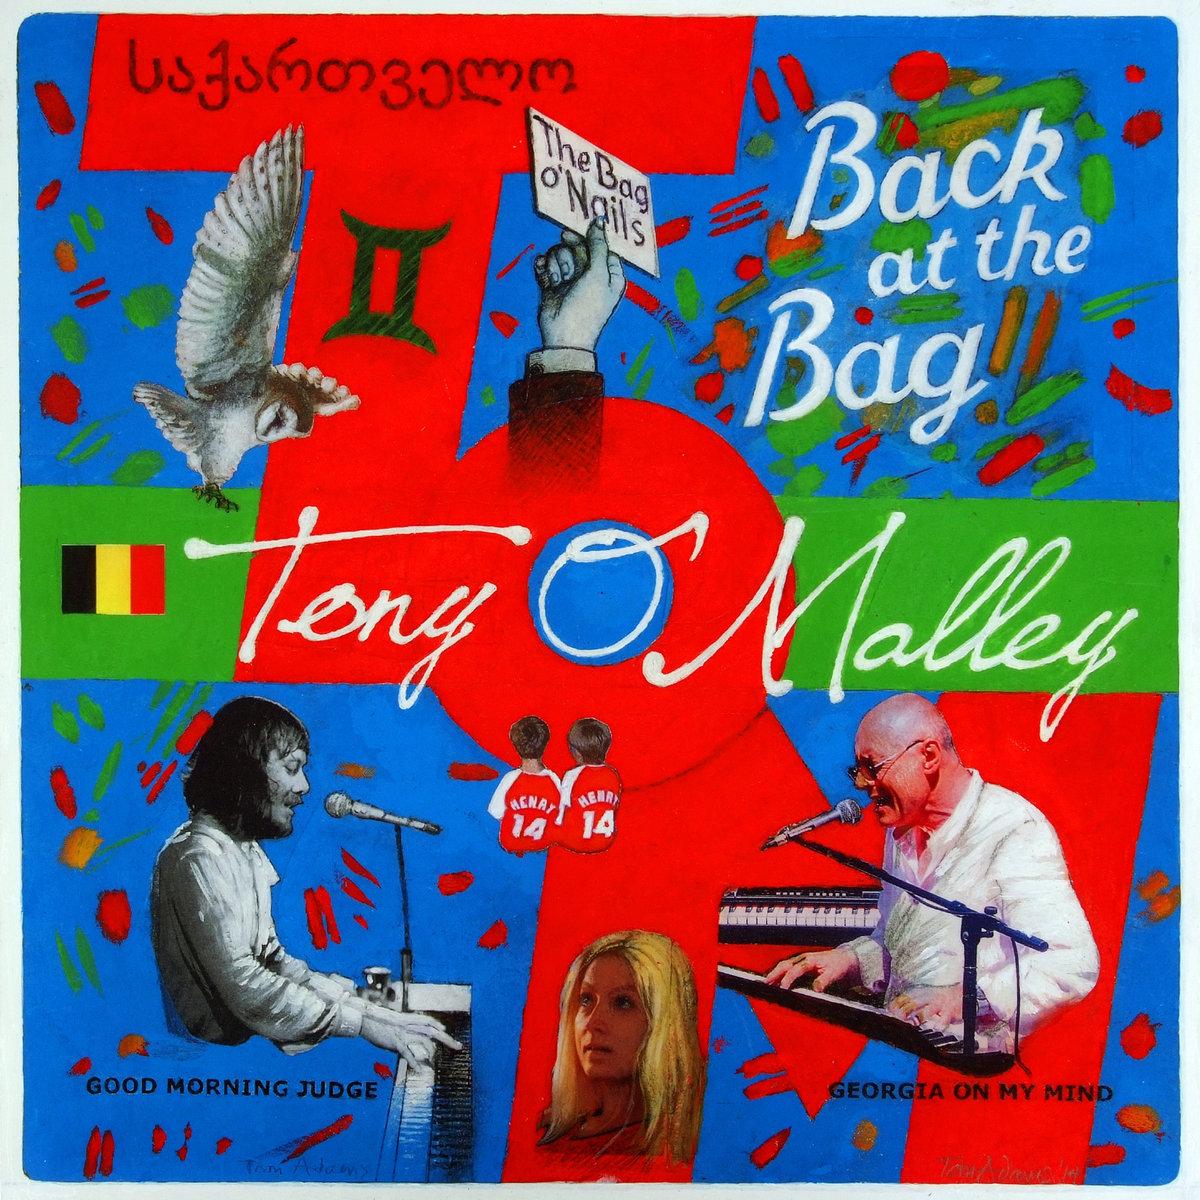 Tony O'Malley - Back at the Bag